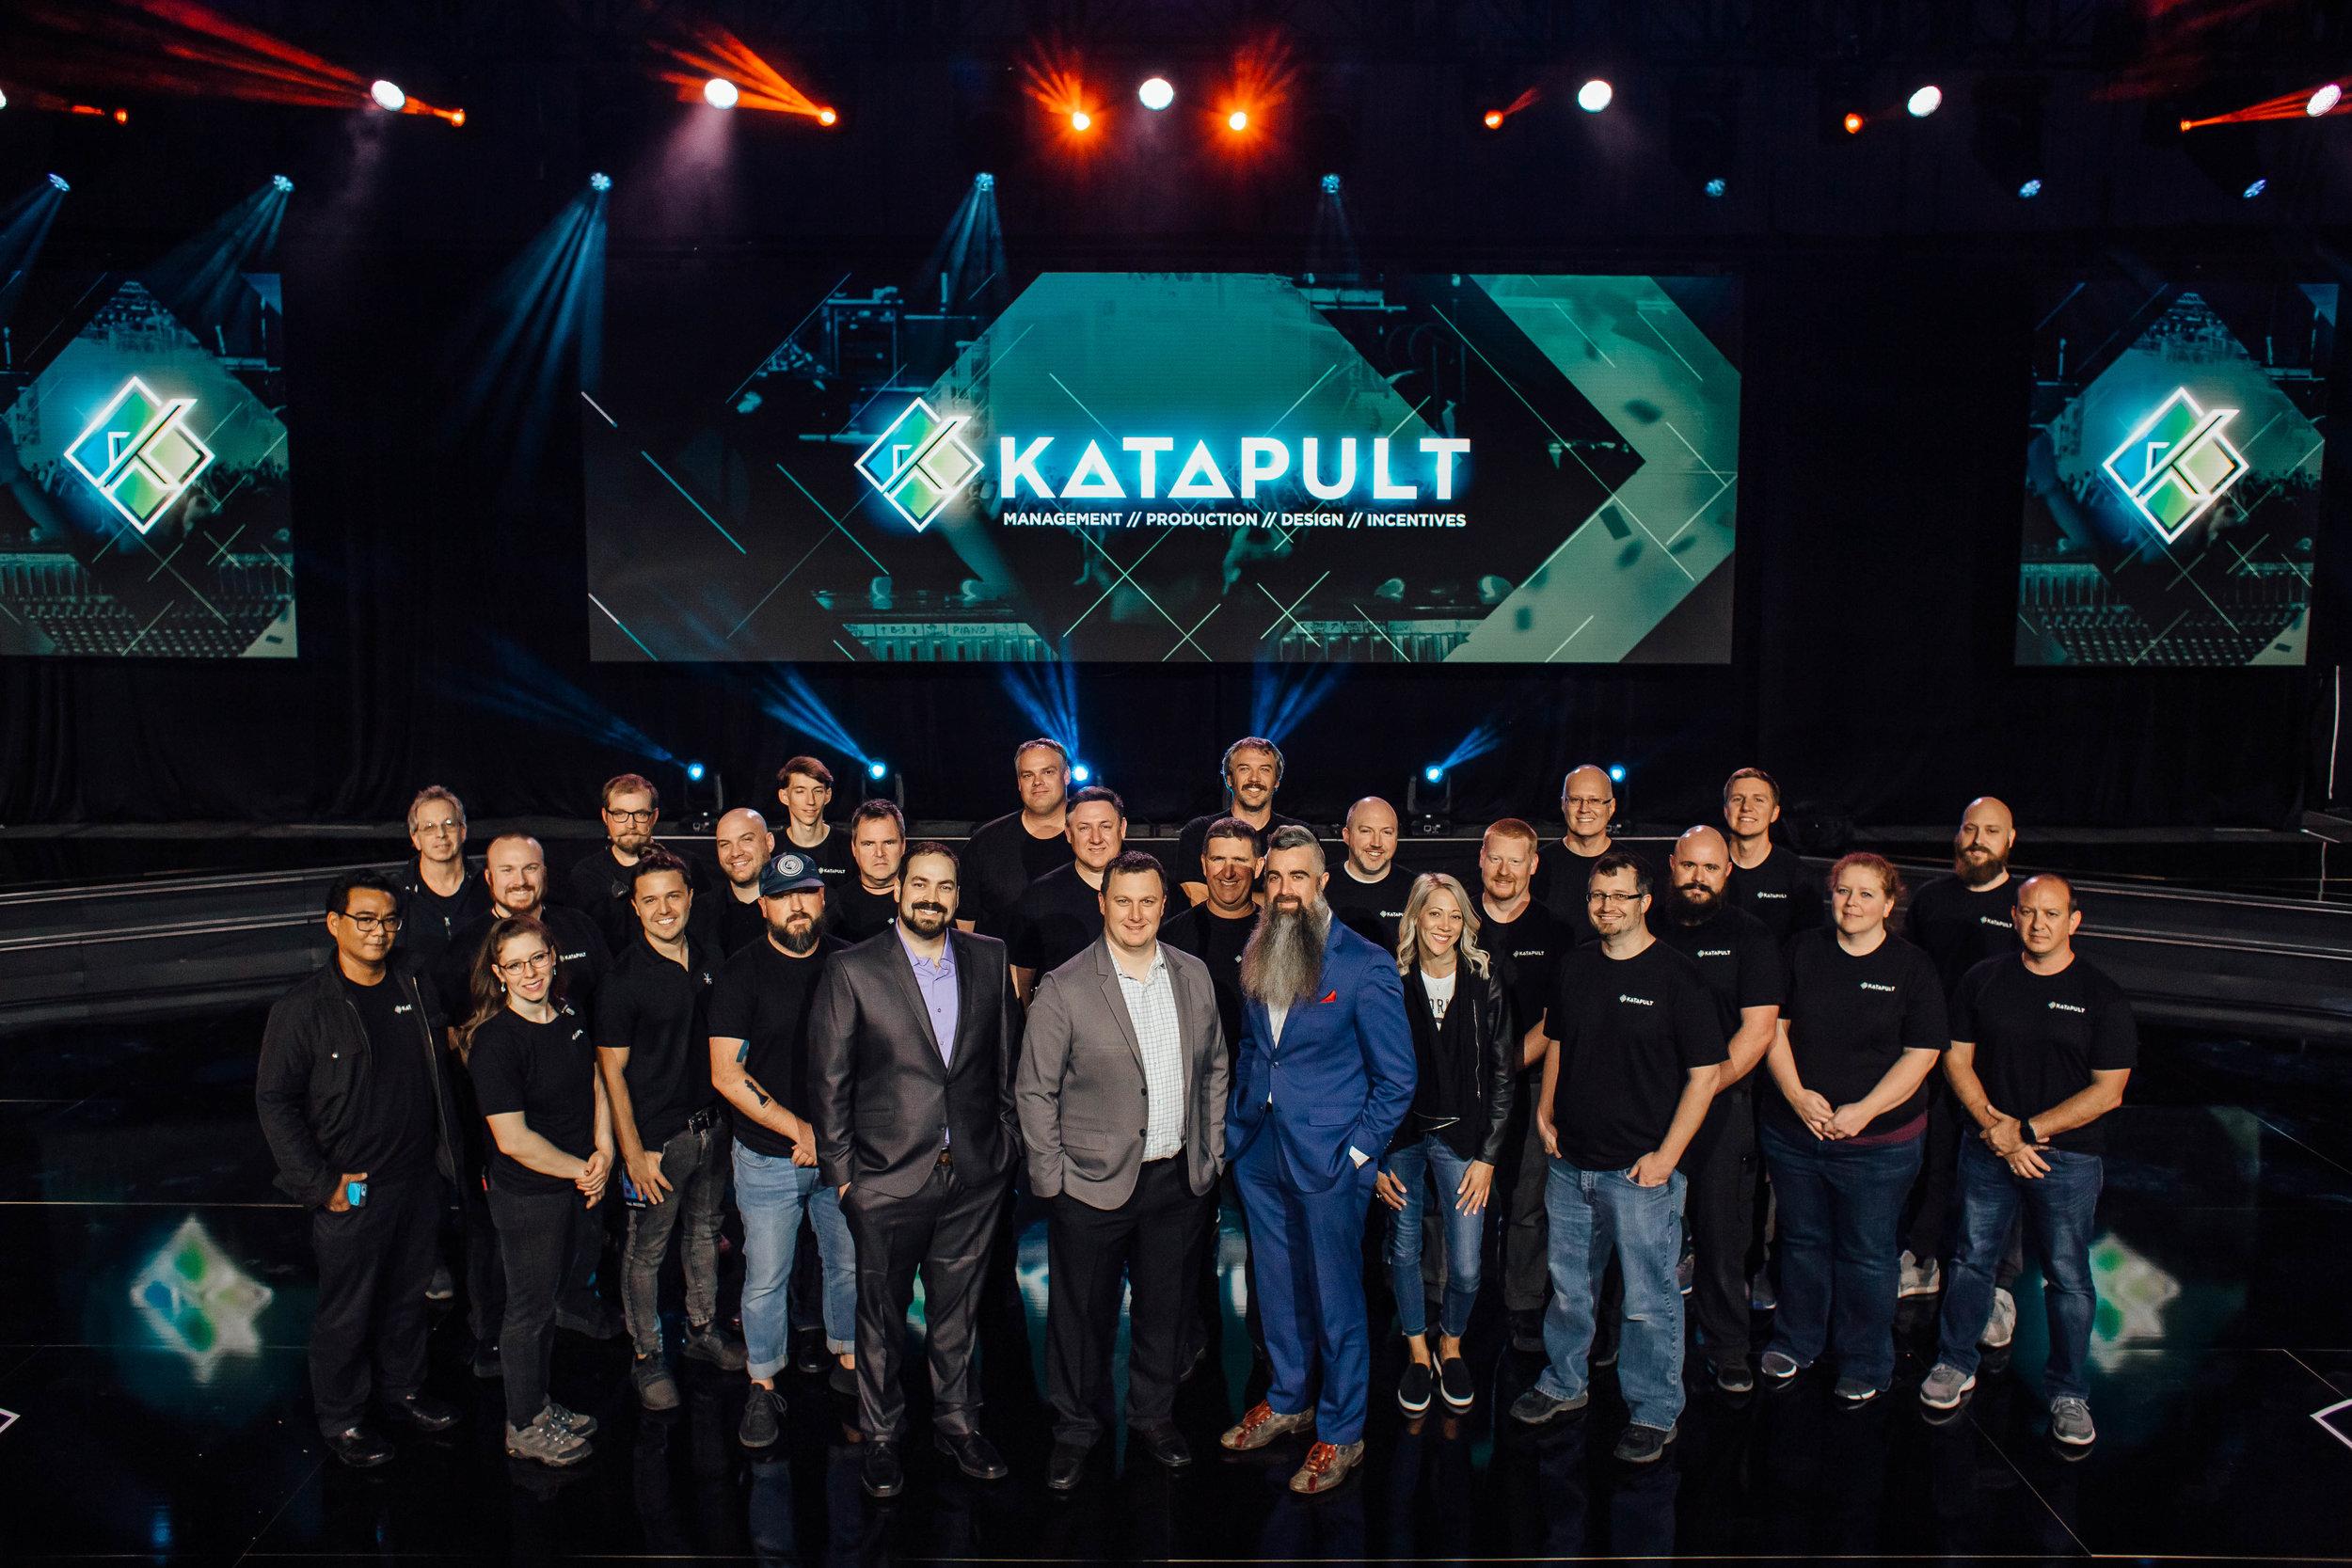 Katapult2019-2.jpg